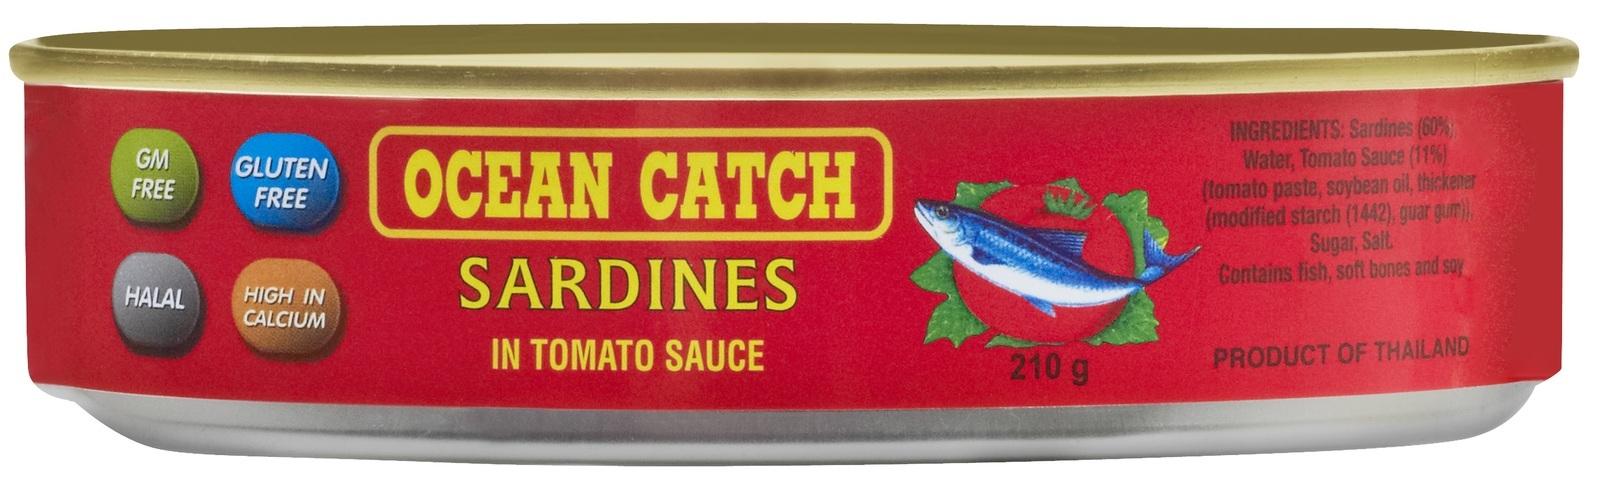 Oceancatch Sardines in Tomato Sauce 210g (12 Pack) image